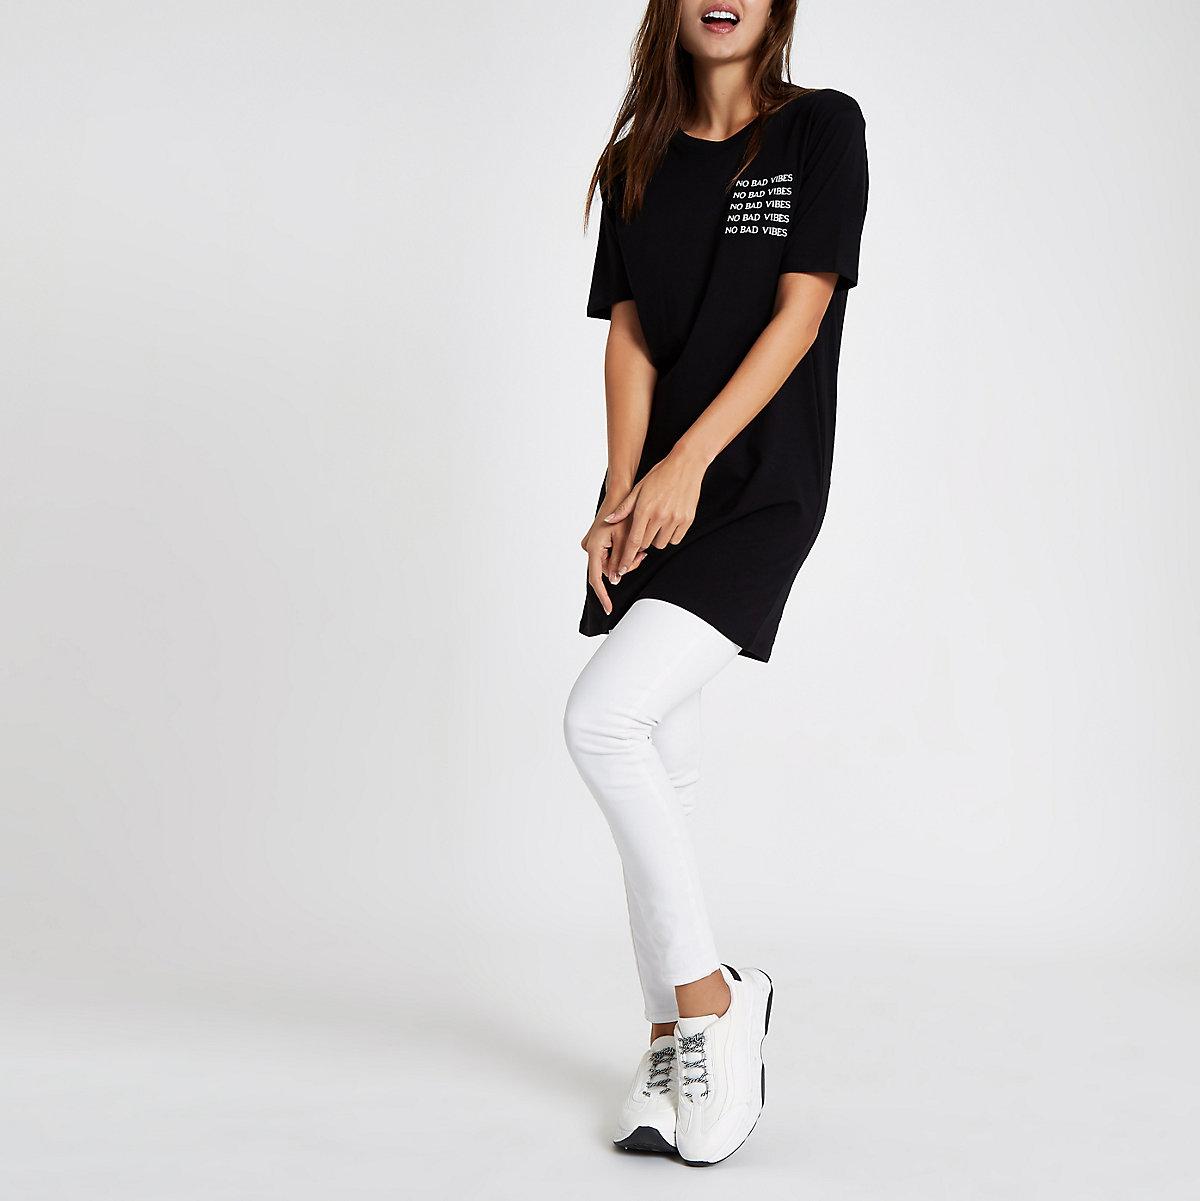 Black 'No Bad Vibes' printed jumbo t-shirt